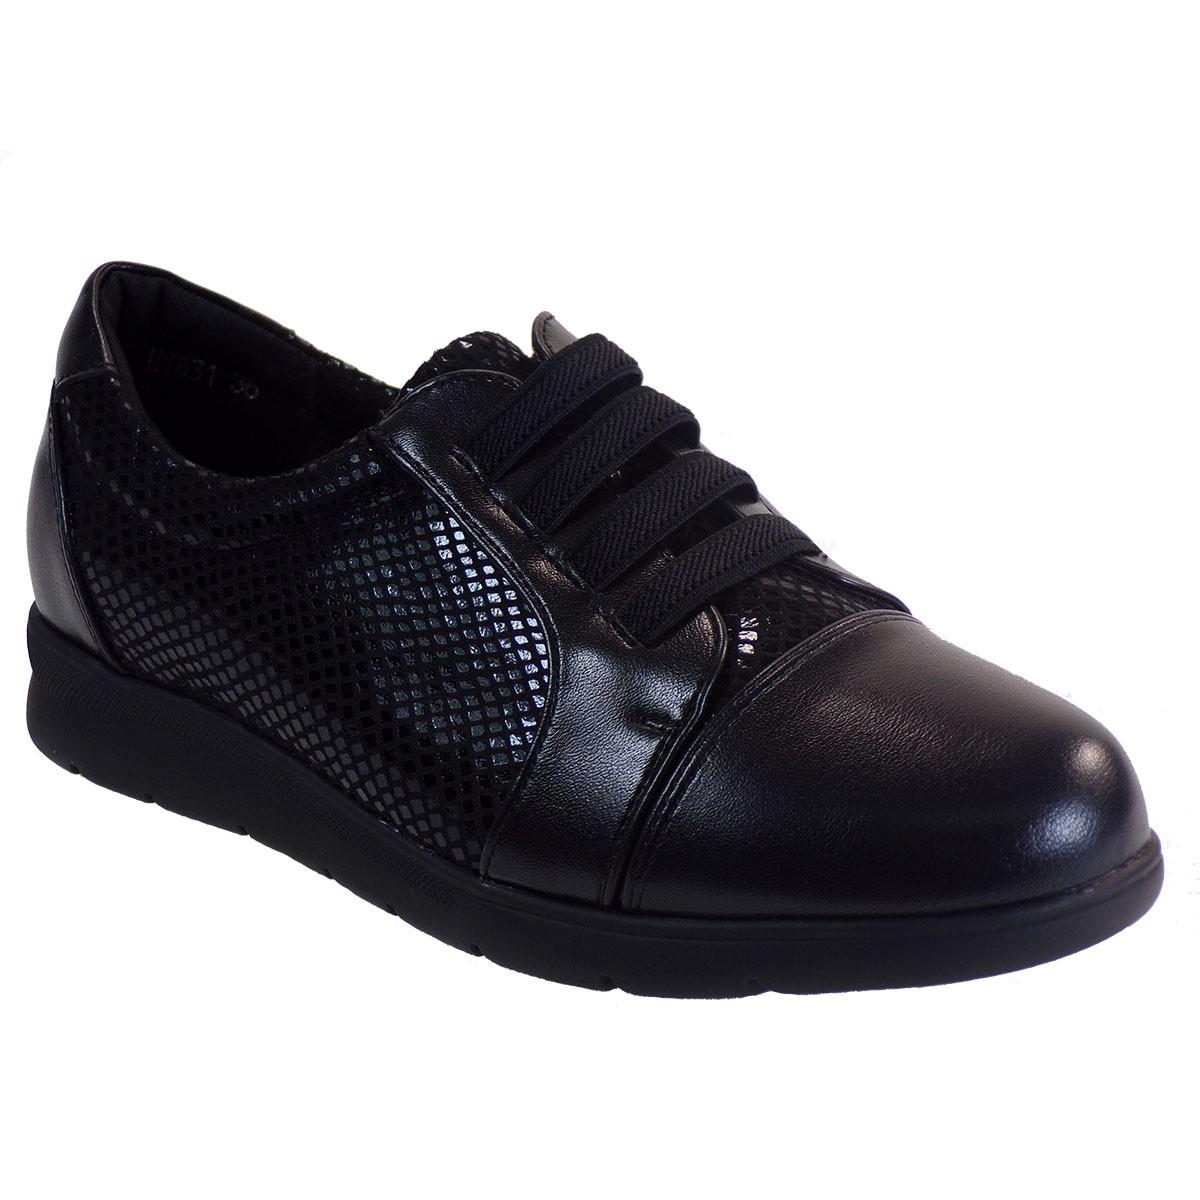 Bagiota Shoes Γυναικεία Παπούτσια Sneakers EJ831 Μαύρο